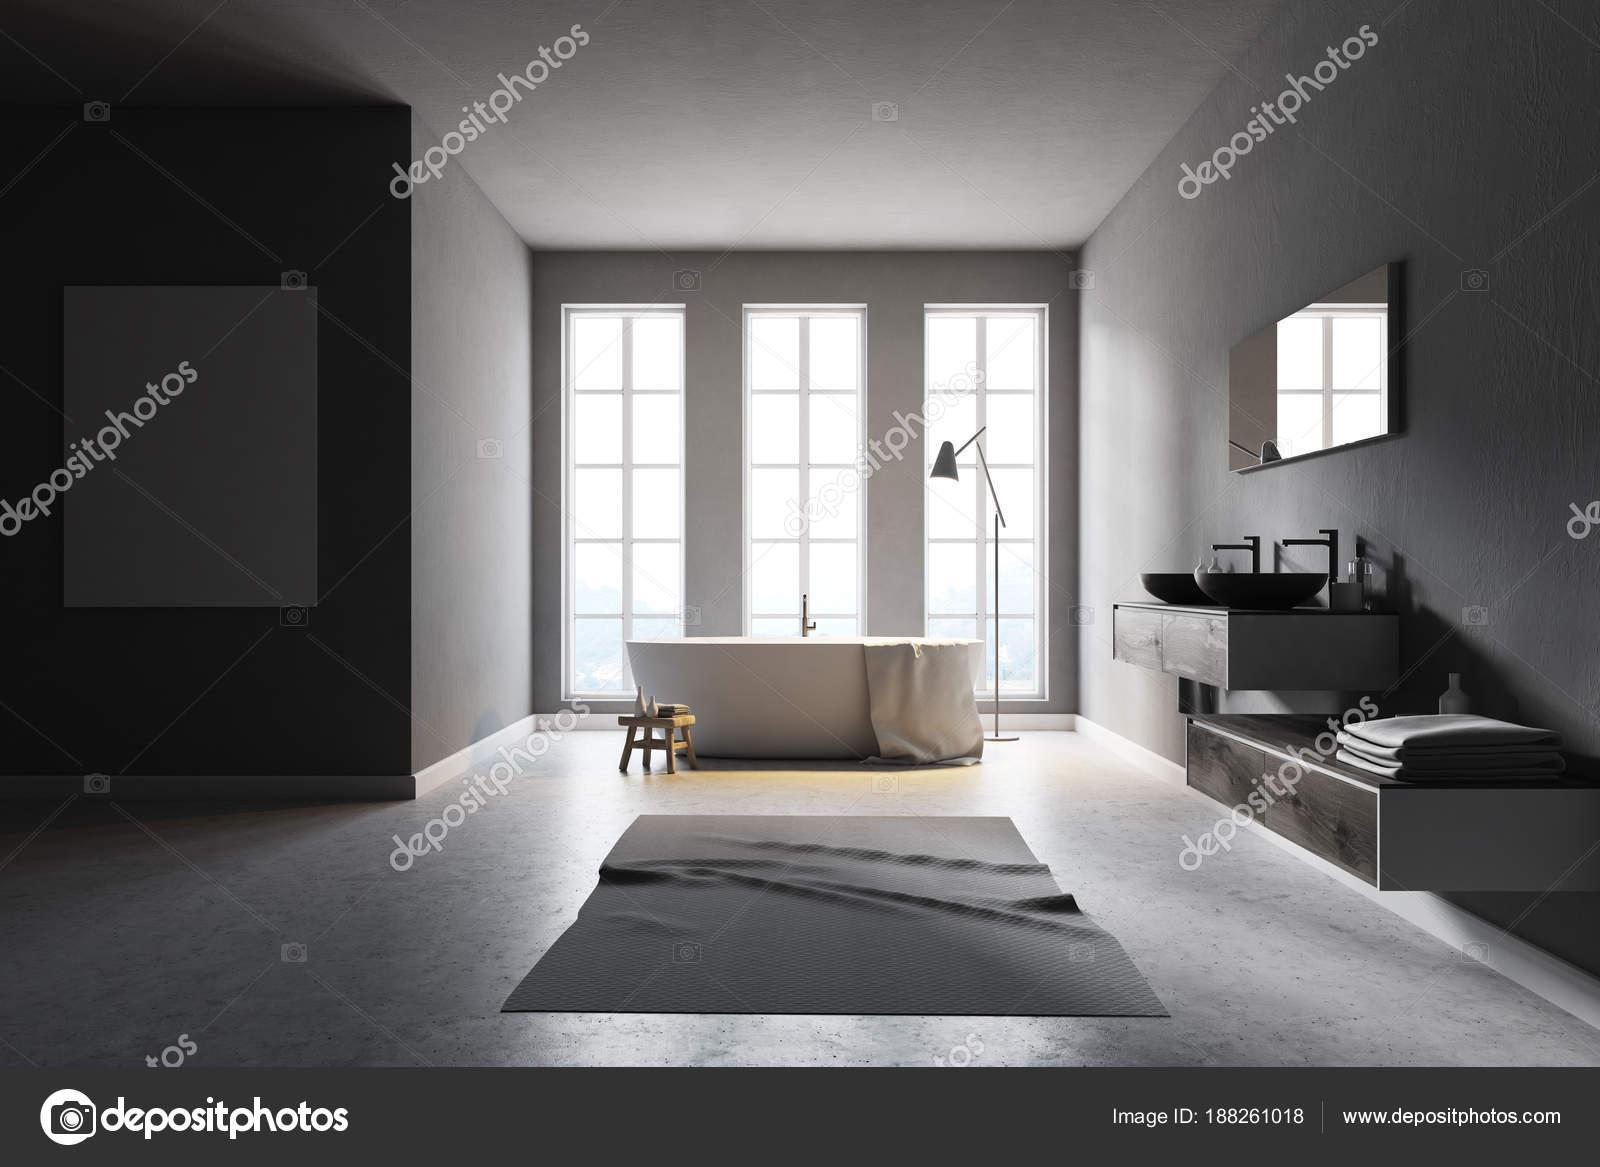 Minimalistische graue bad poster u2014 stockfoto © denisismagilov